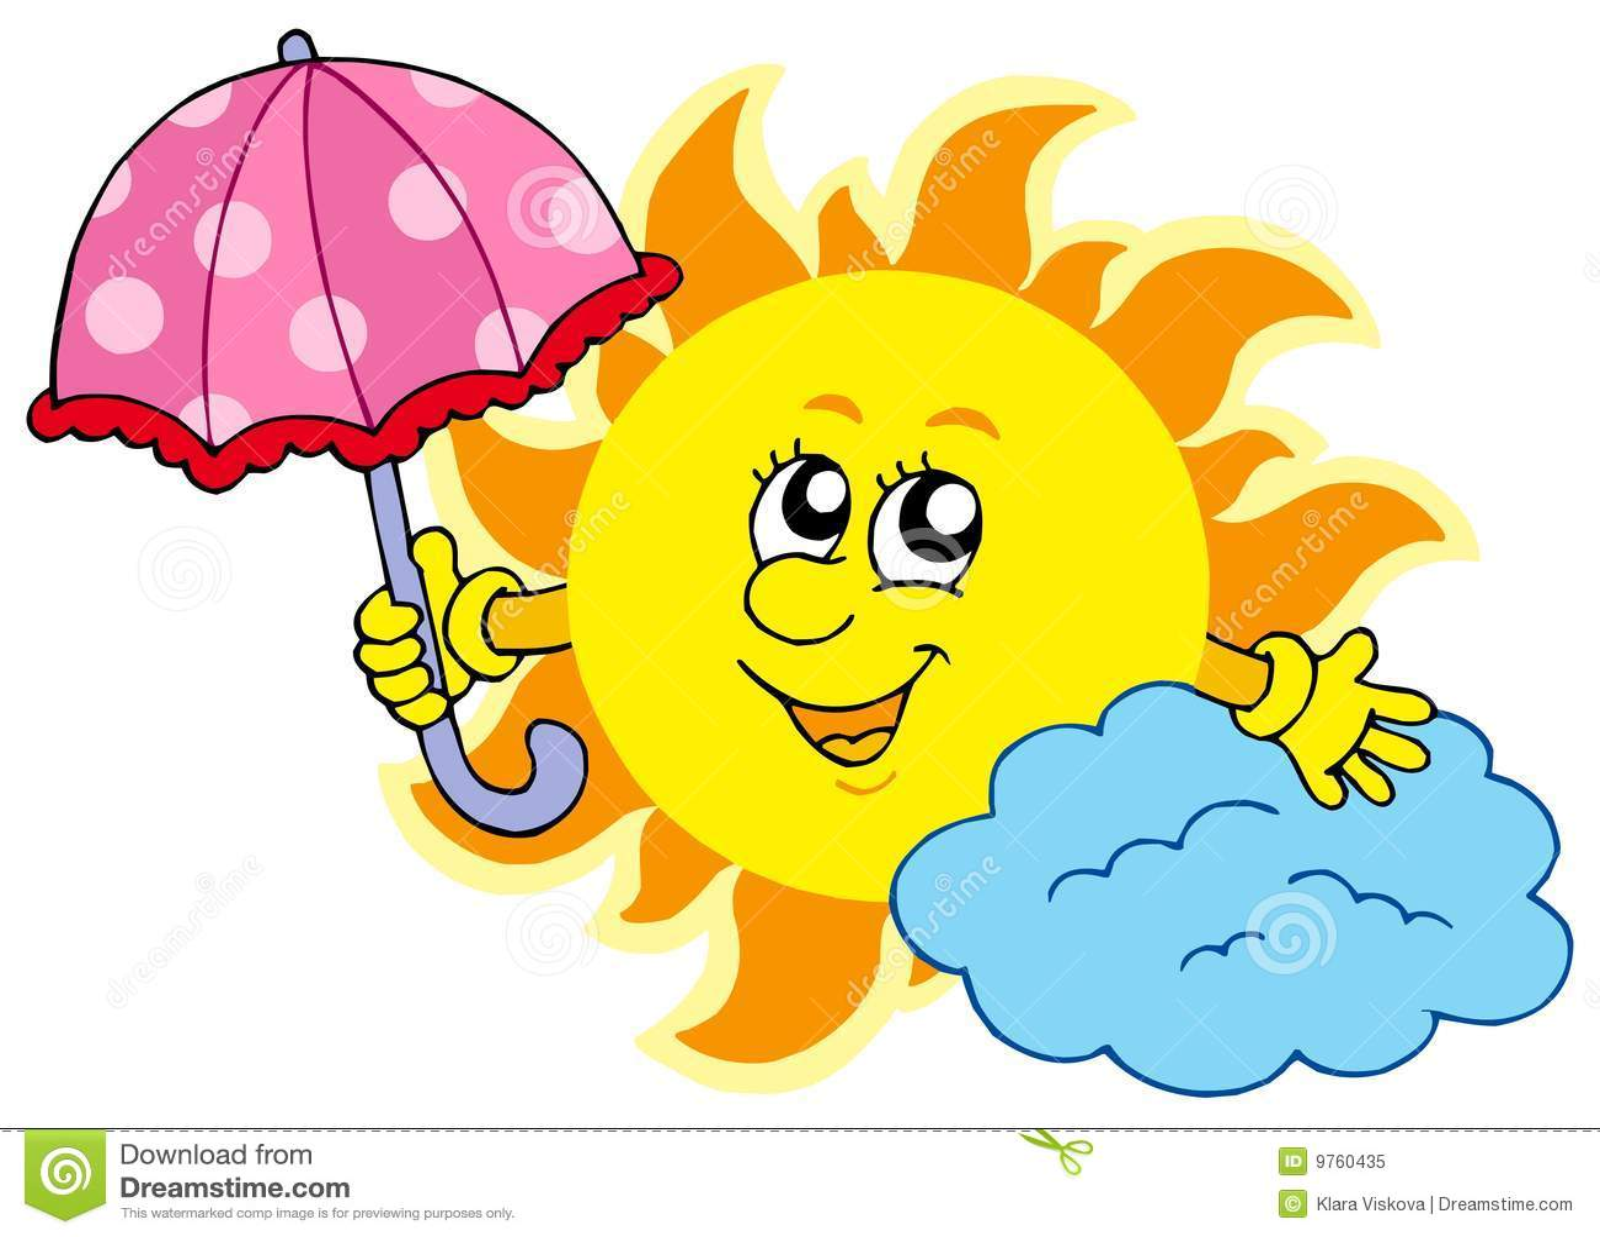 Cute Cartoon Sun With Umbrella Royalty Free Stock Photo ... Relaxing Dog Bath